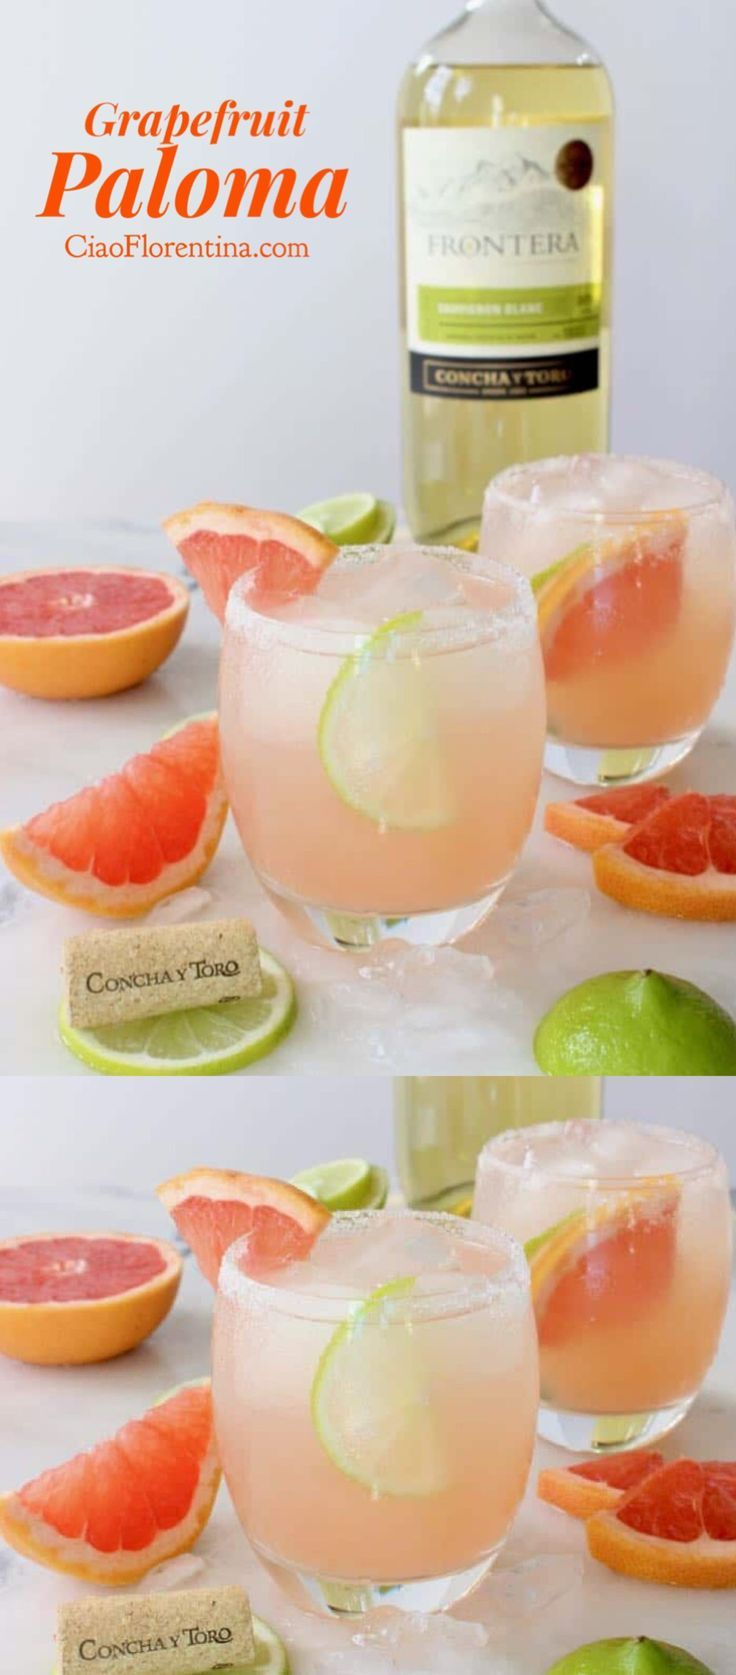 Paloma Cocktail Recipe | http://CiaoFlorentina.com @CiaoFlorentina